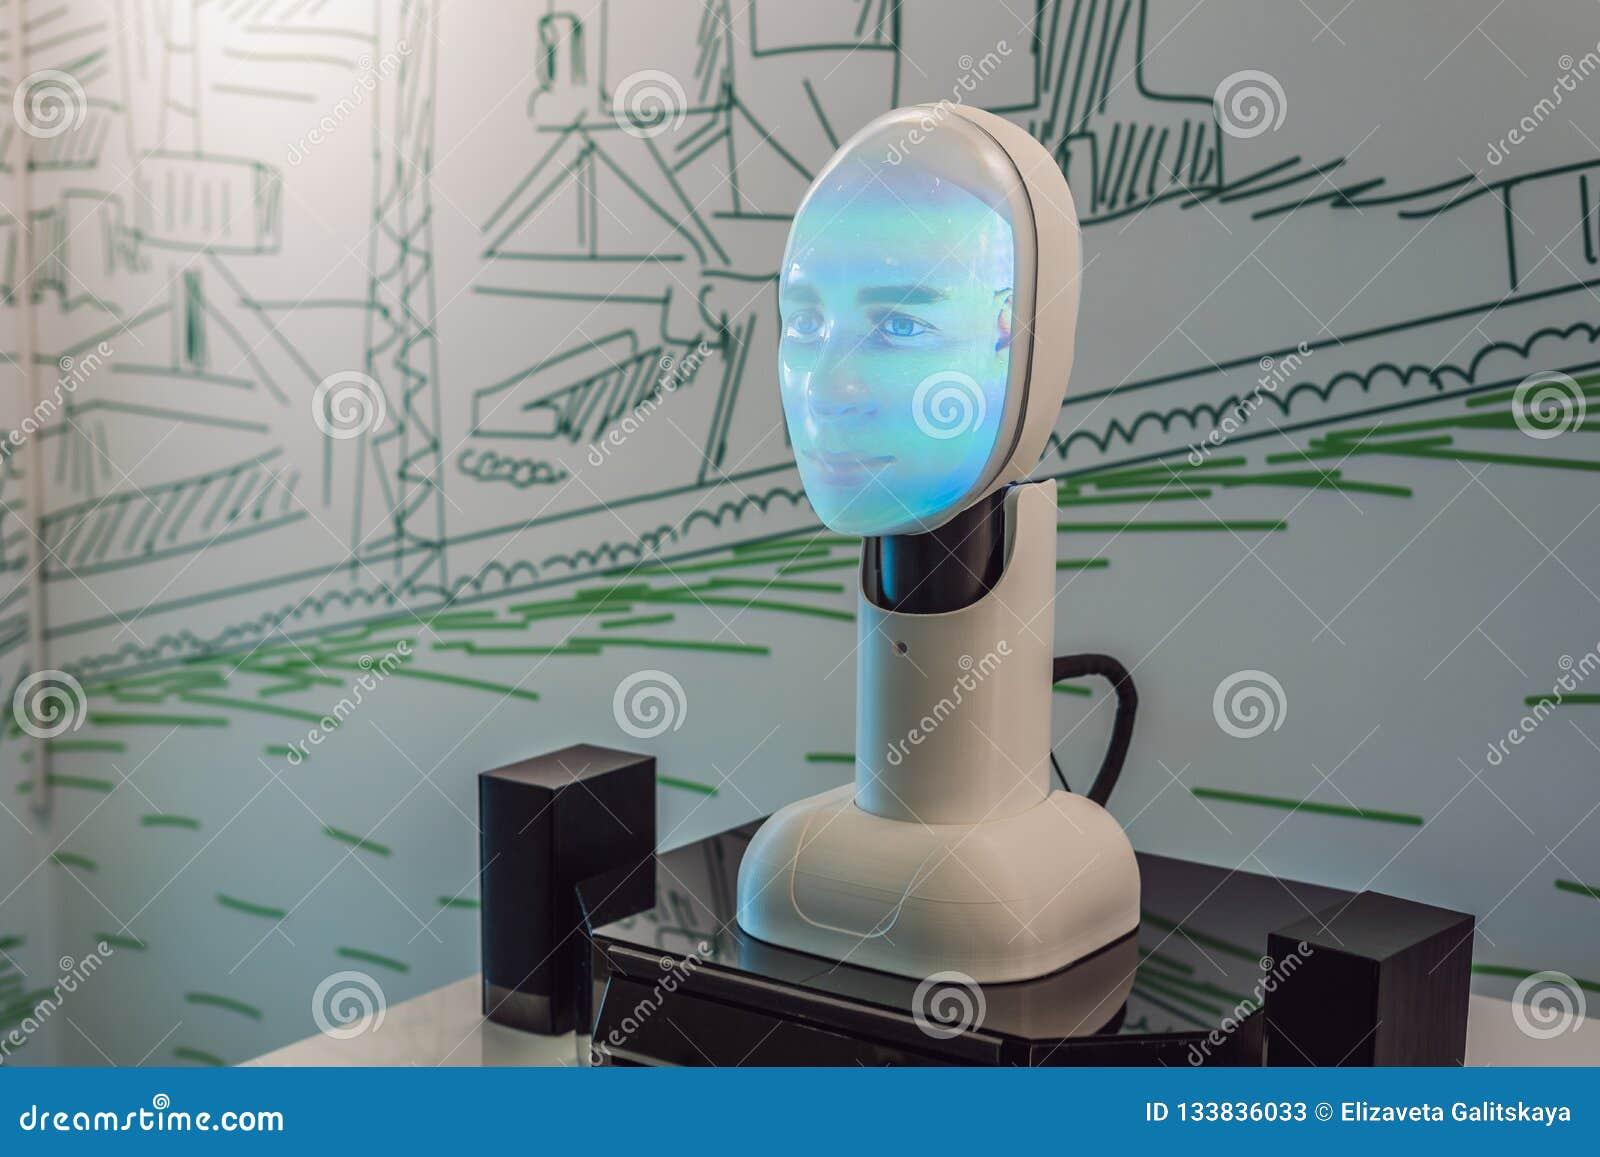 Russia, Vladivostok, September 12, 2018: Artificial intelligence, a robot that can talk